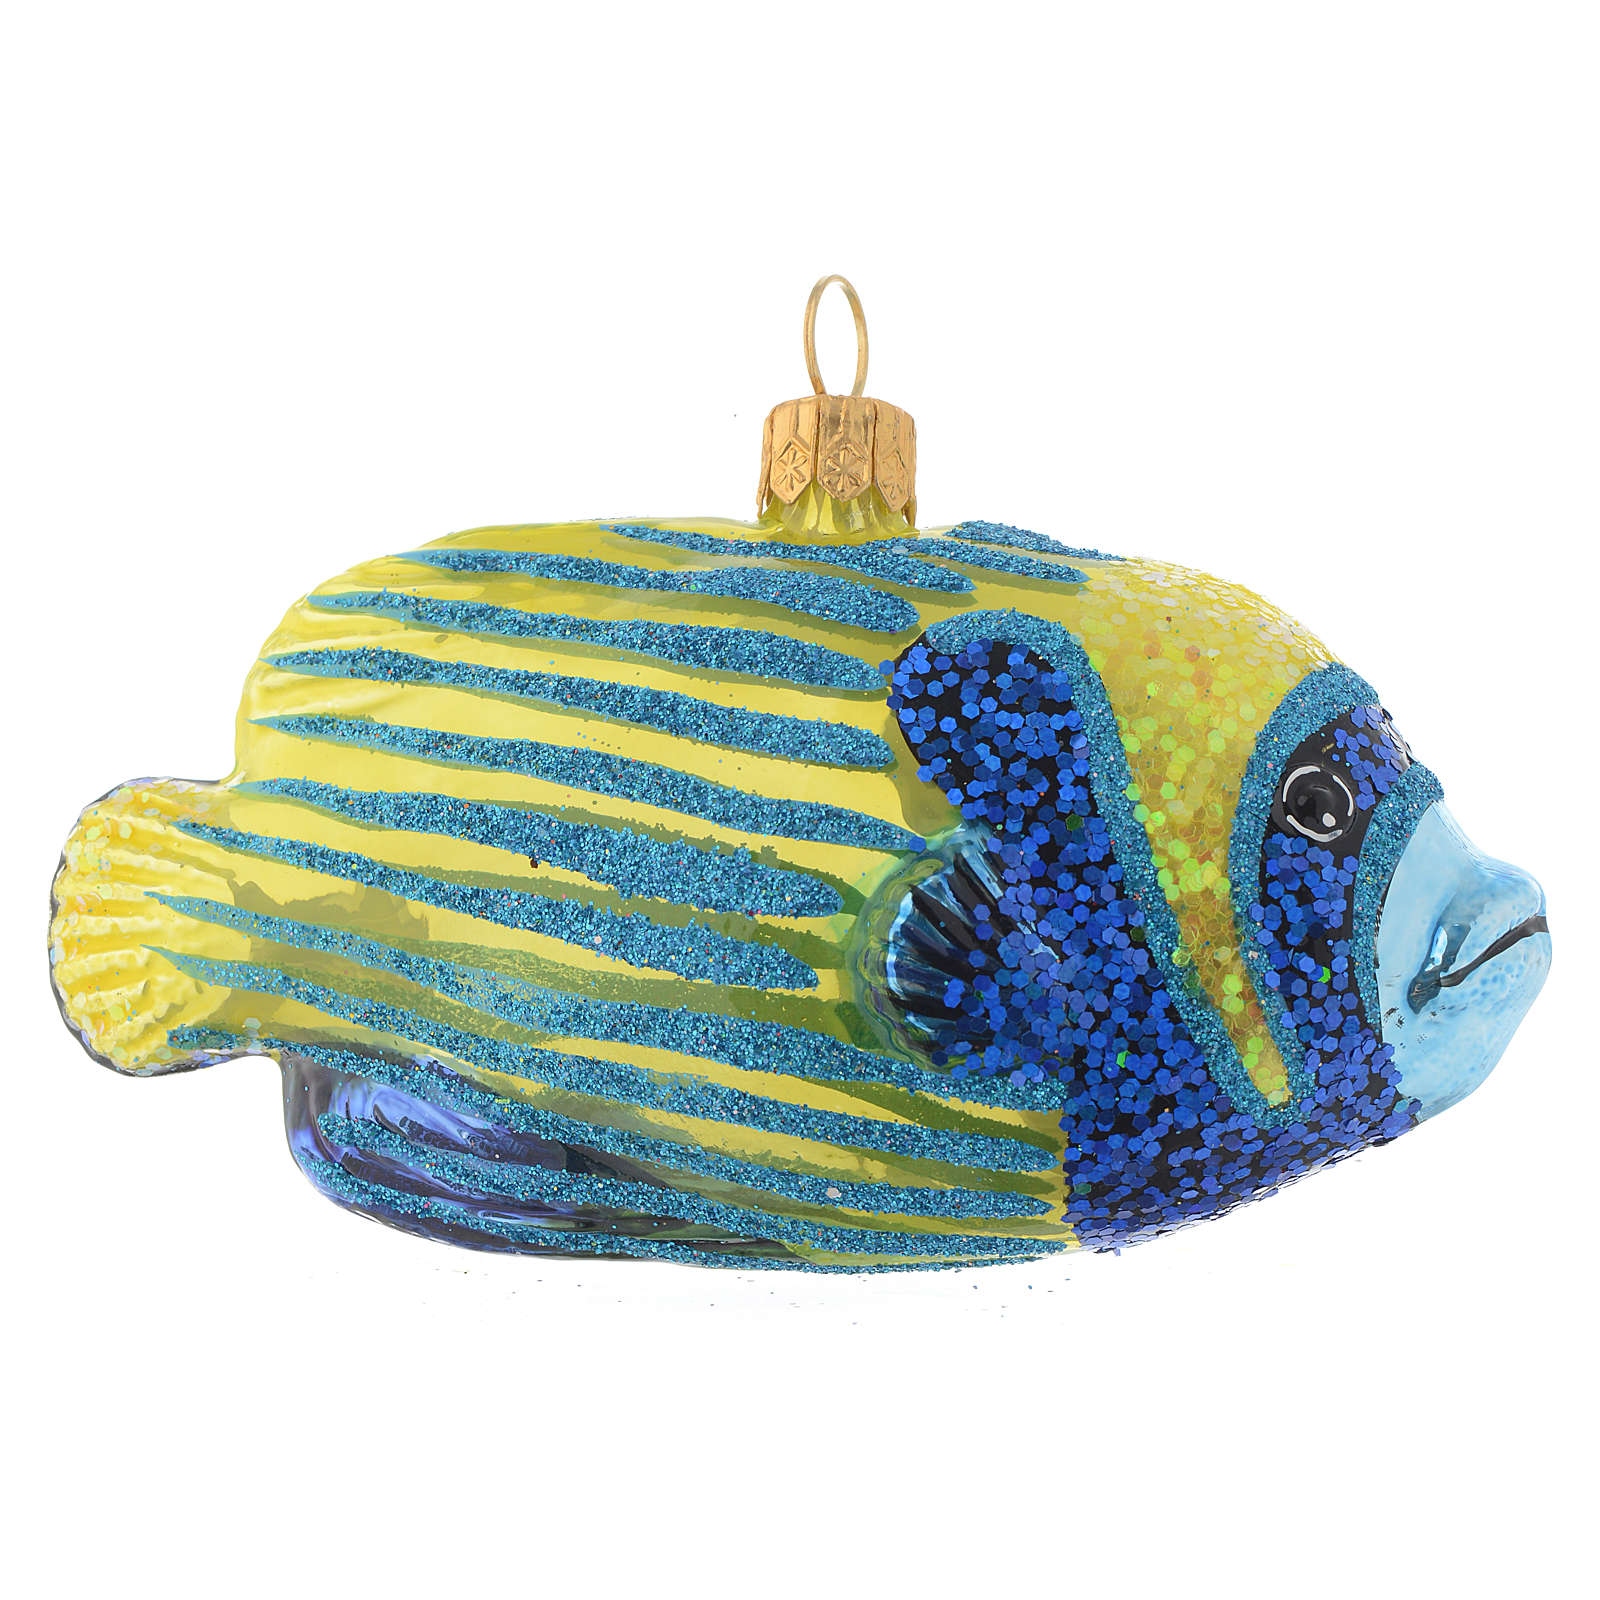 Blown glass Christmas ornament, emperor angelfish 4